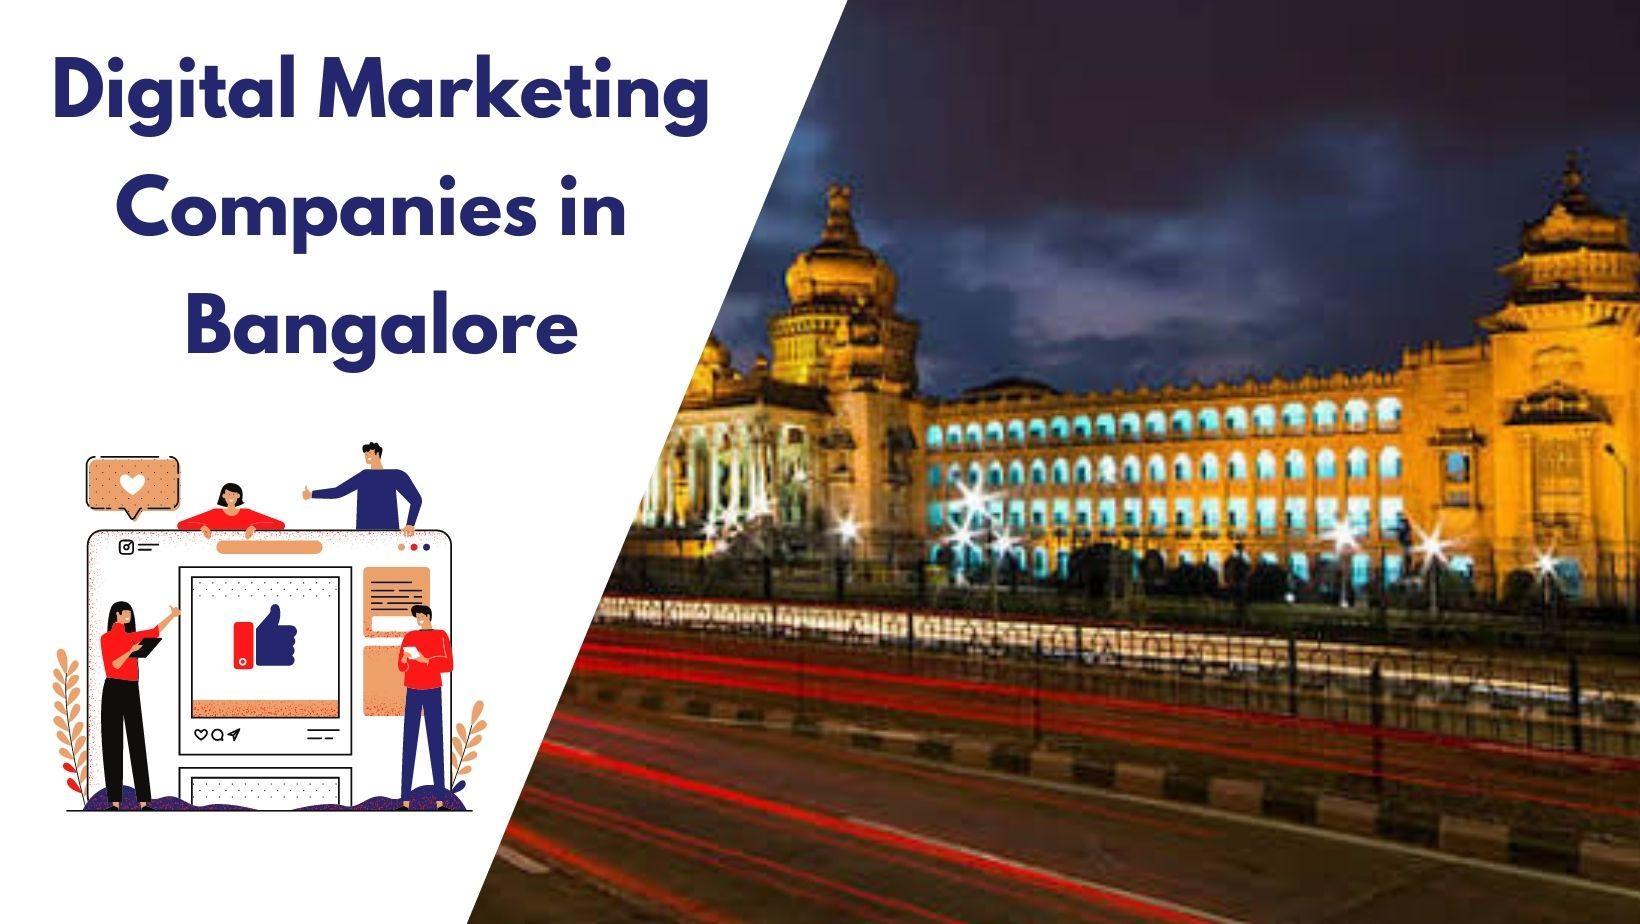 Digital marketing in Bangalore